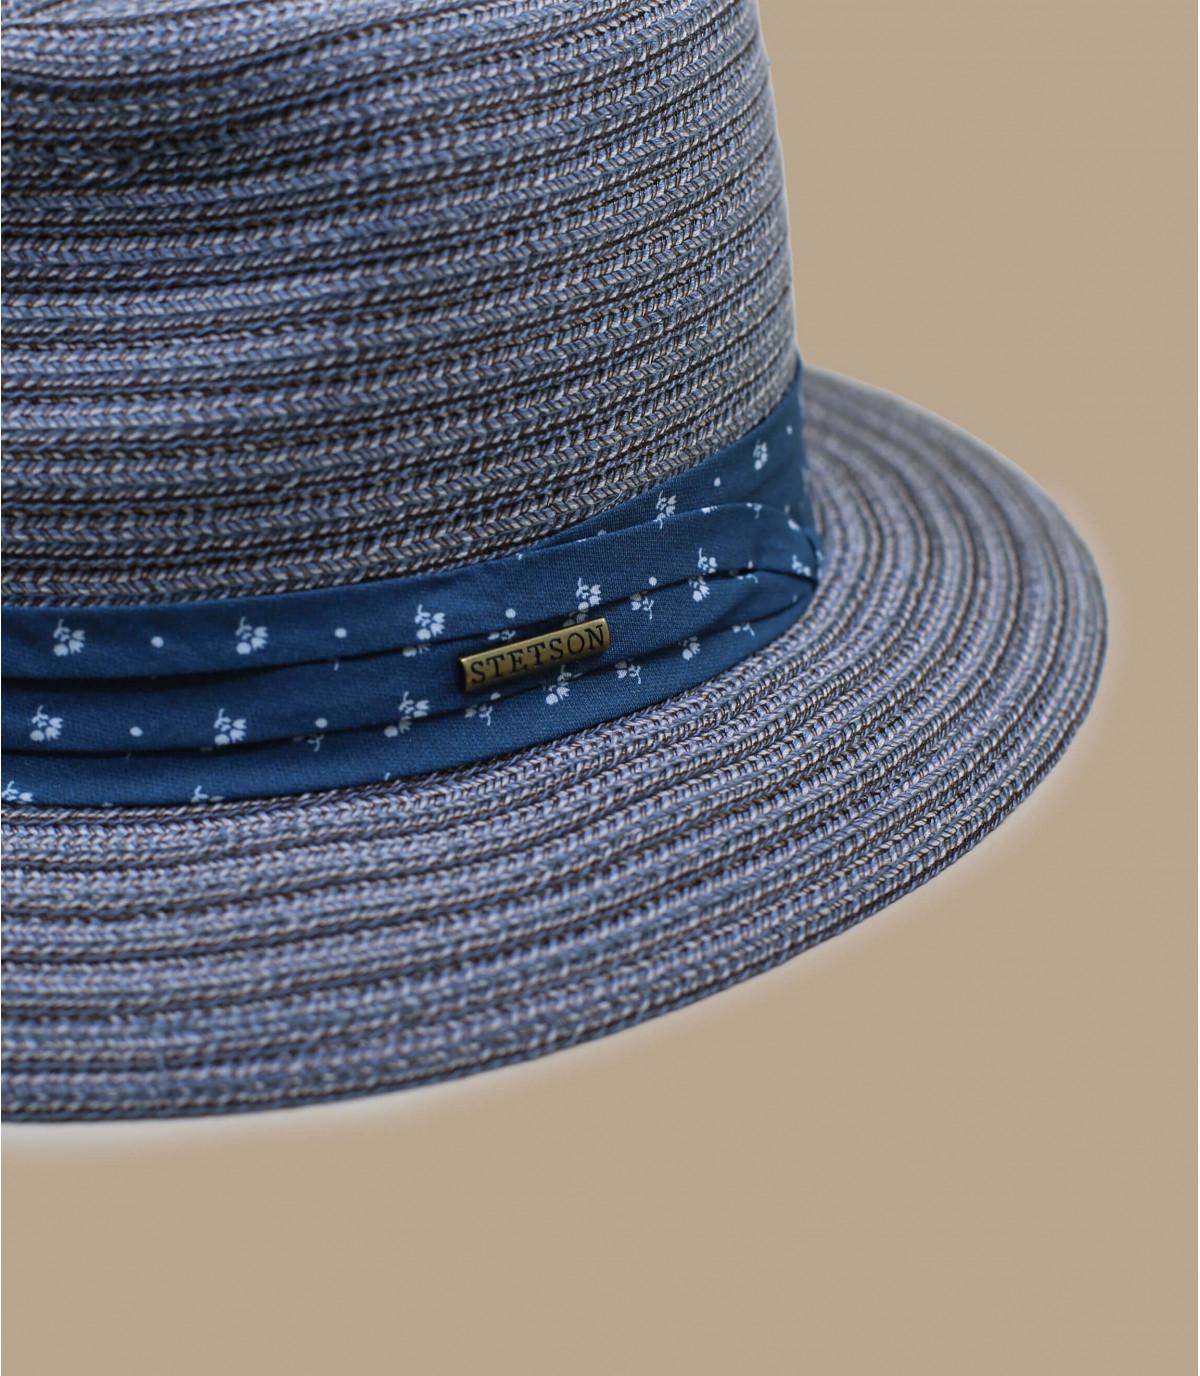 Details Traveller stripe braid blue grey - afbeeling 2